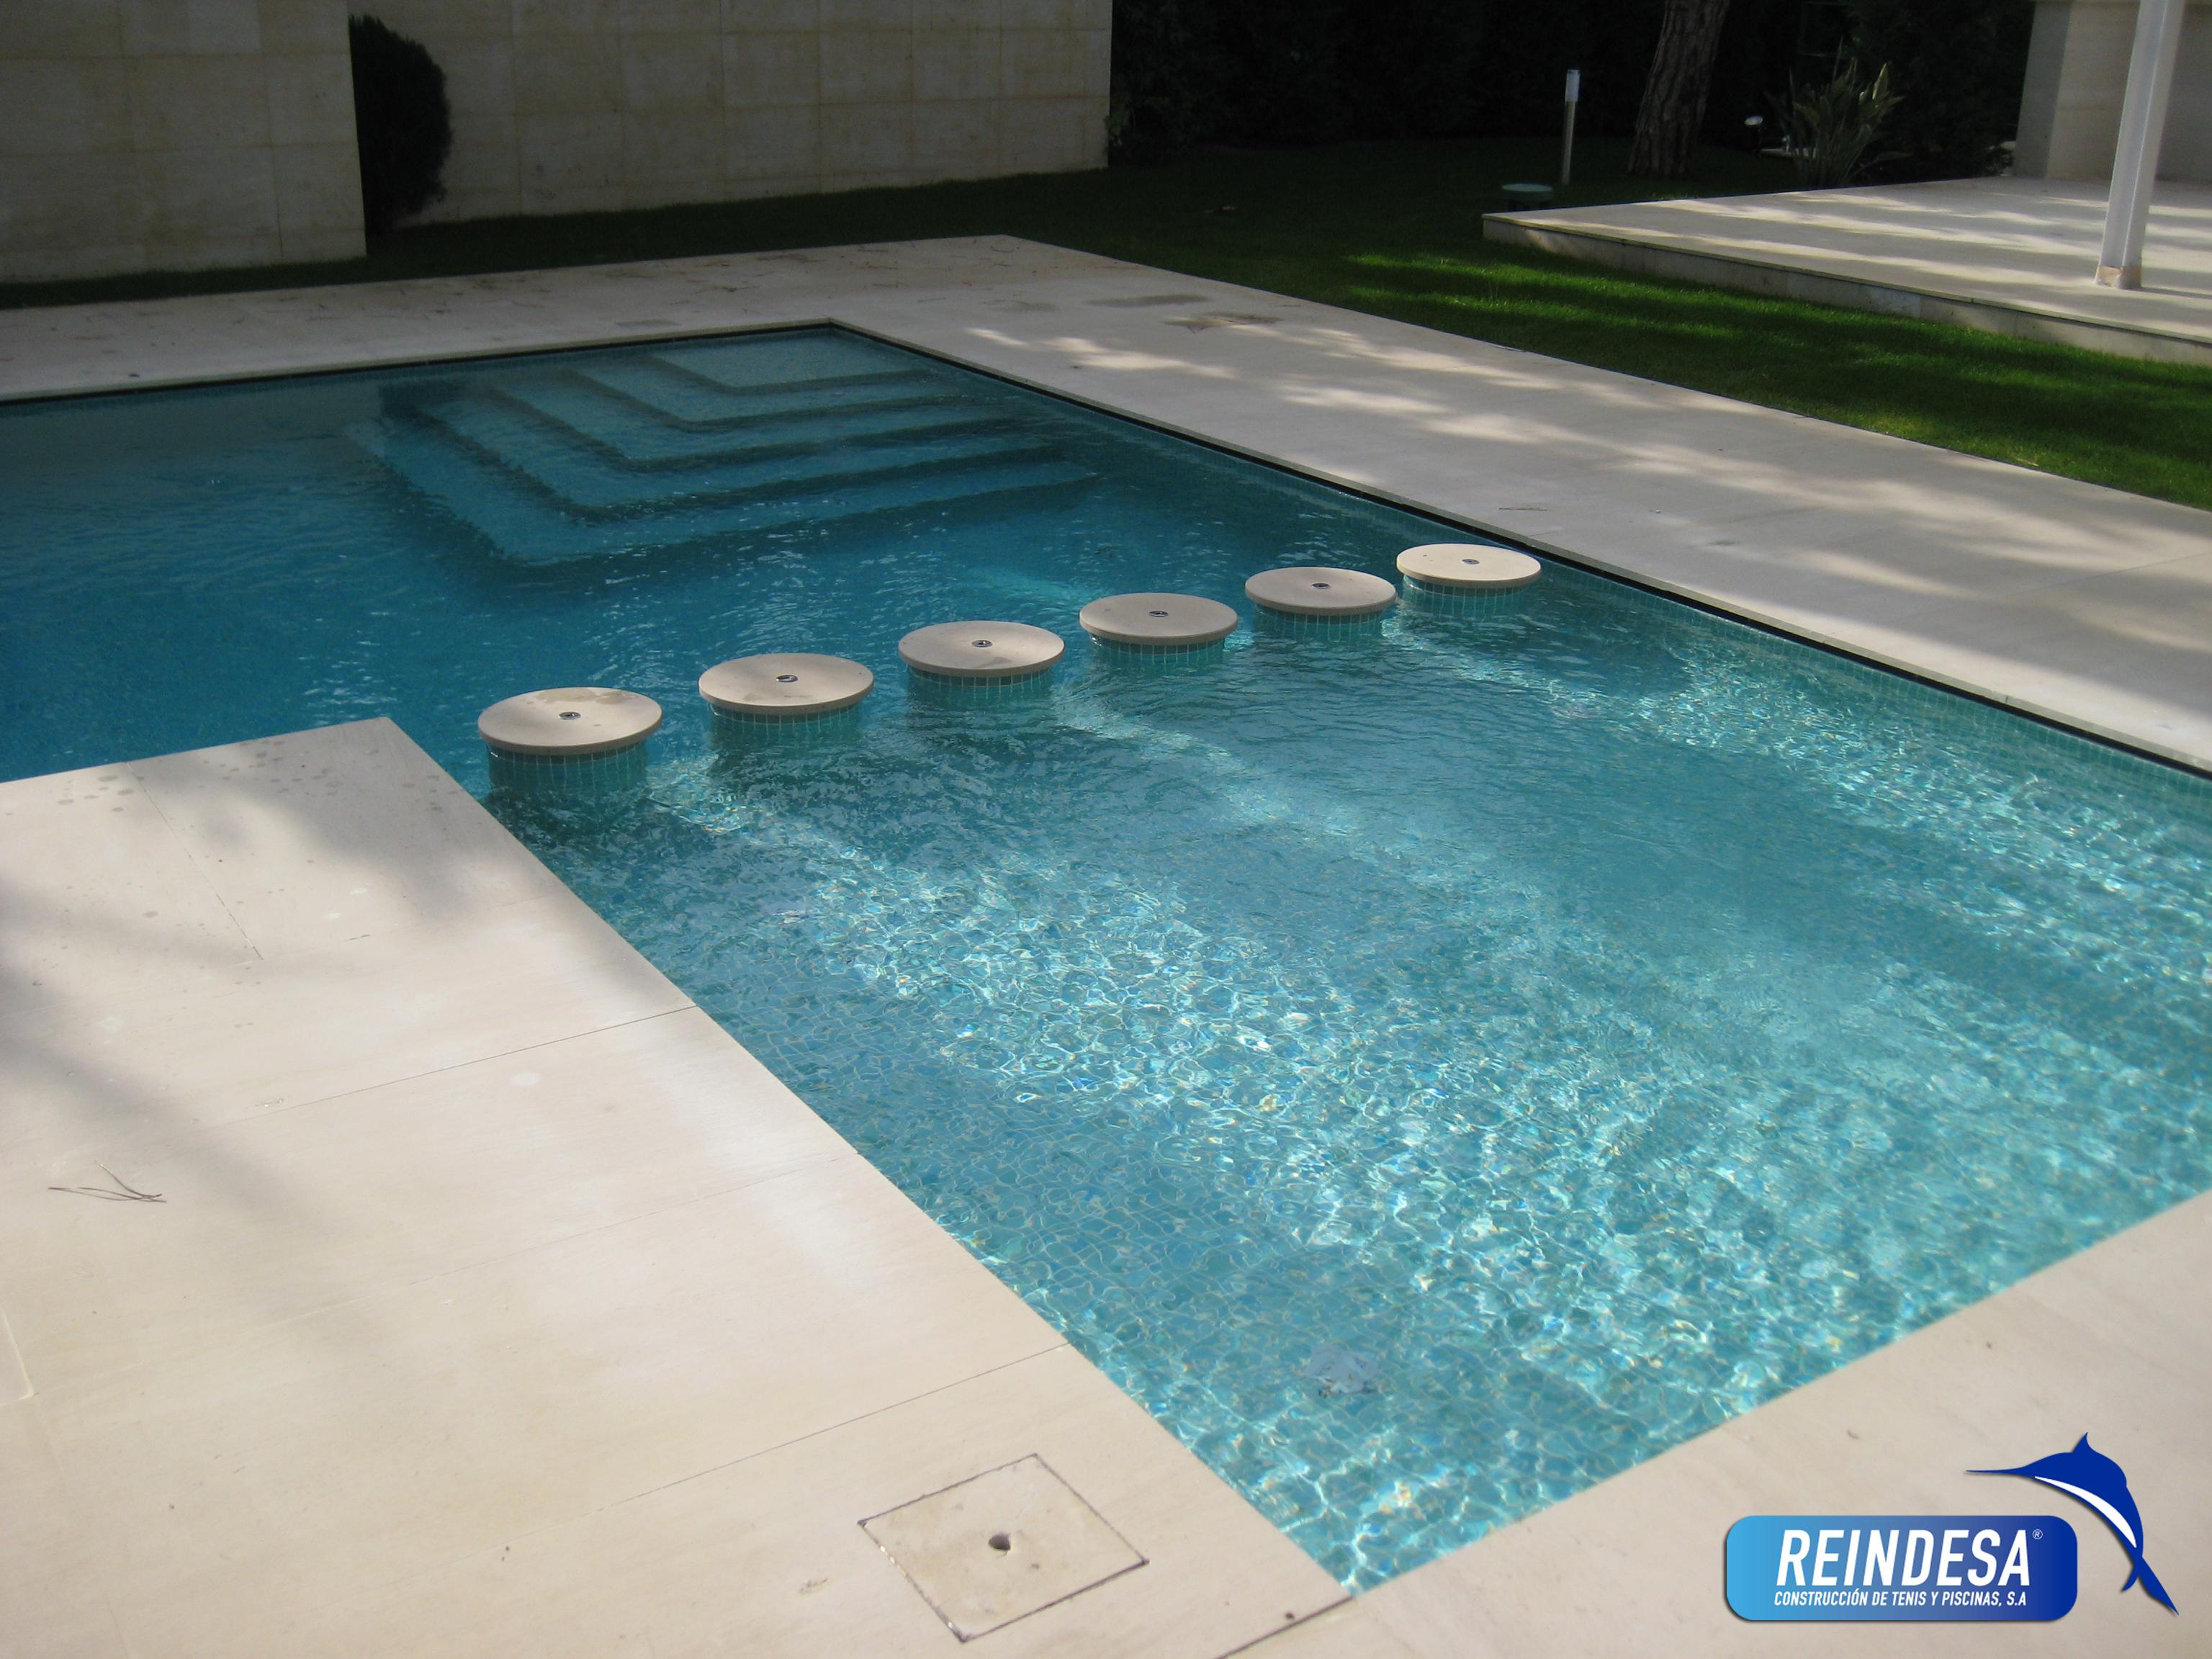 Desbordante reindesa mantenimiento de piscinas - Gresite piscinas colores ...